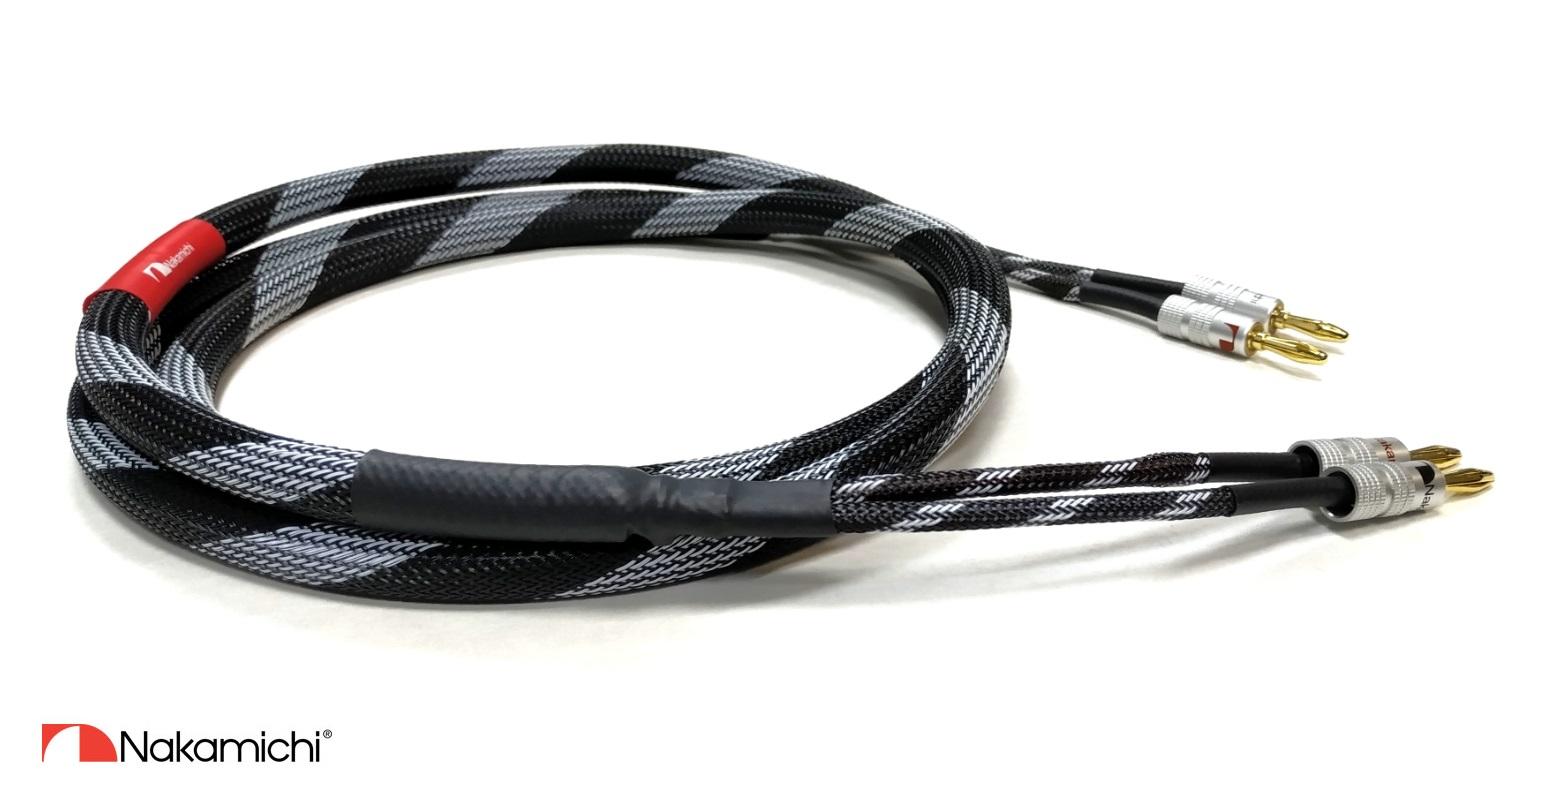 Nakamichi - Speaker Cable 6N20